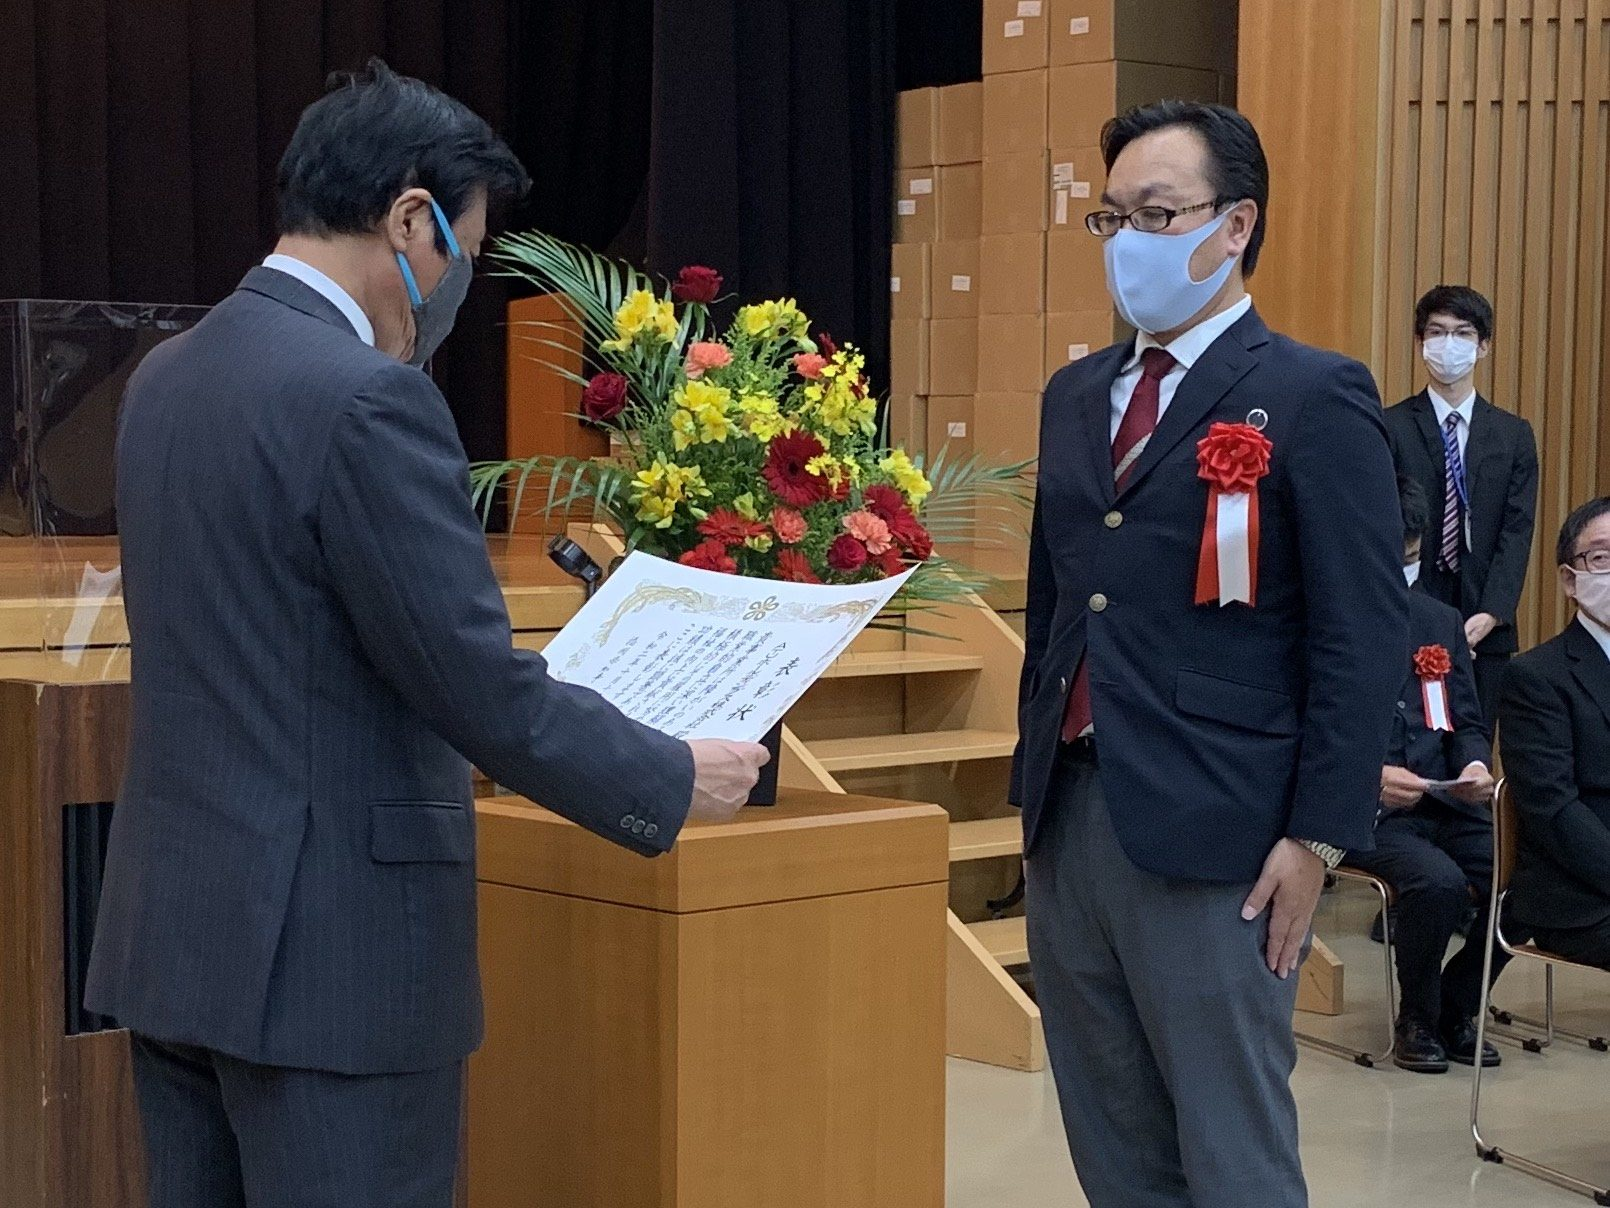 ATU 福岡 警備 障がい者雇用 雇用促進大会 福岡県知事表彰 授賞式2